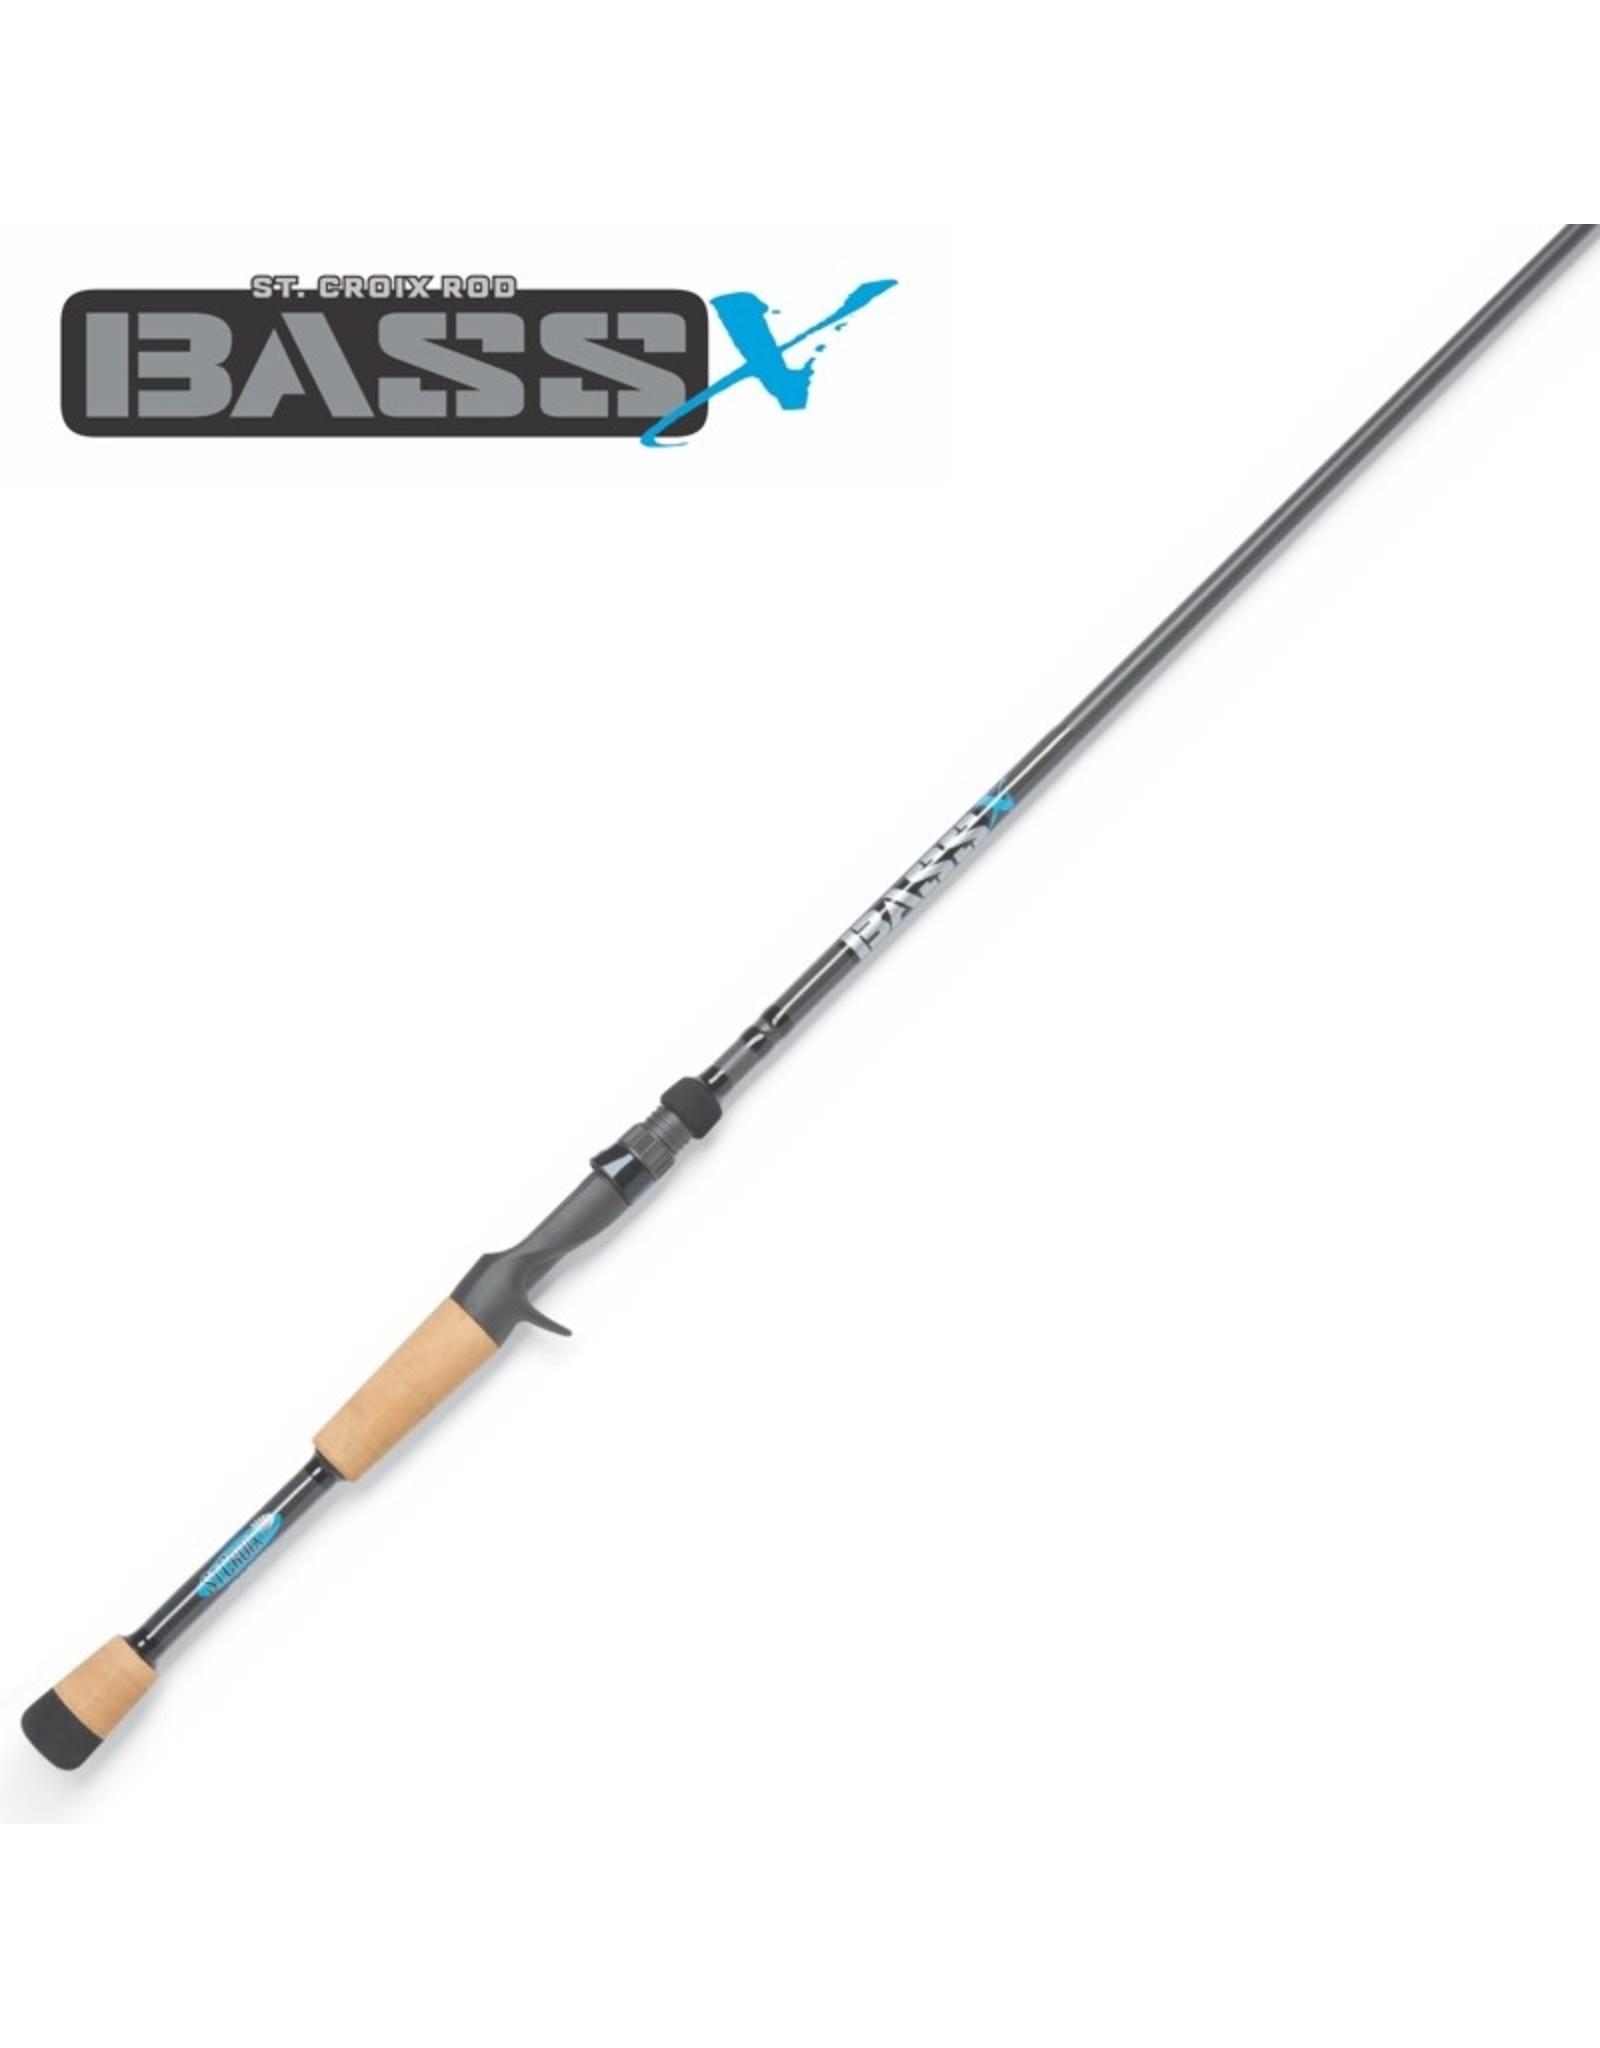 St. Croix Bass X Casting Rods 7'4 HF